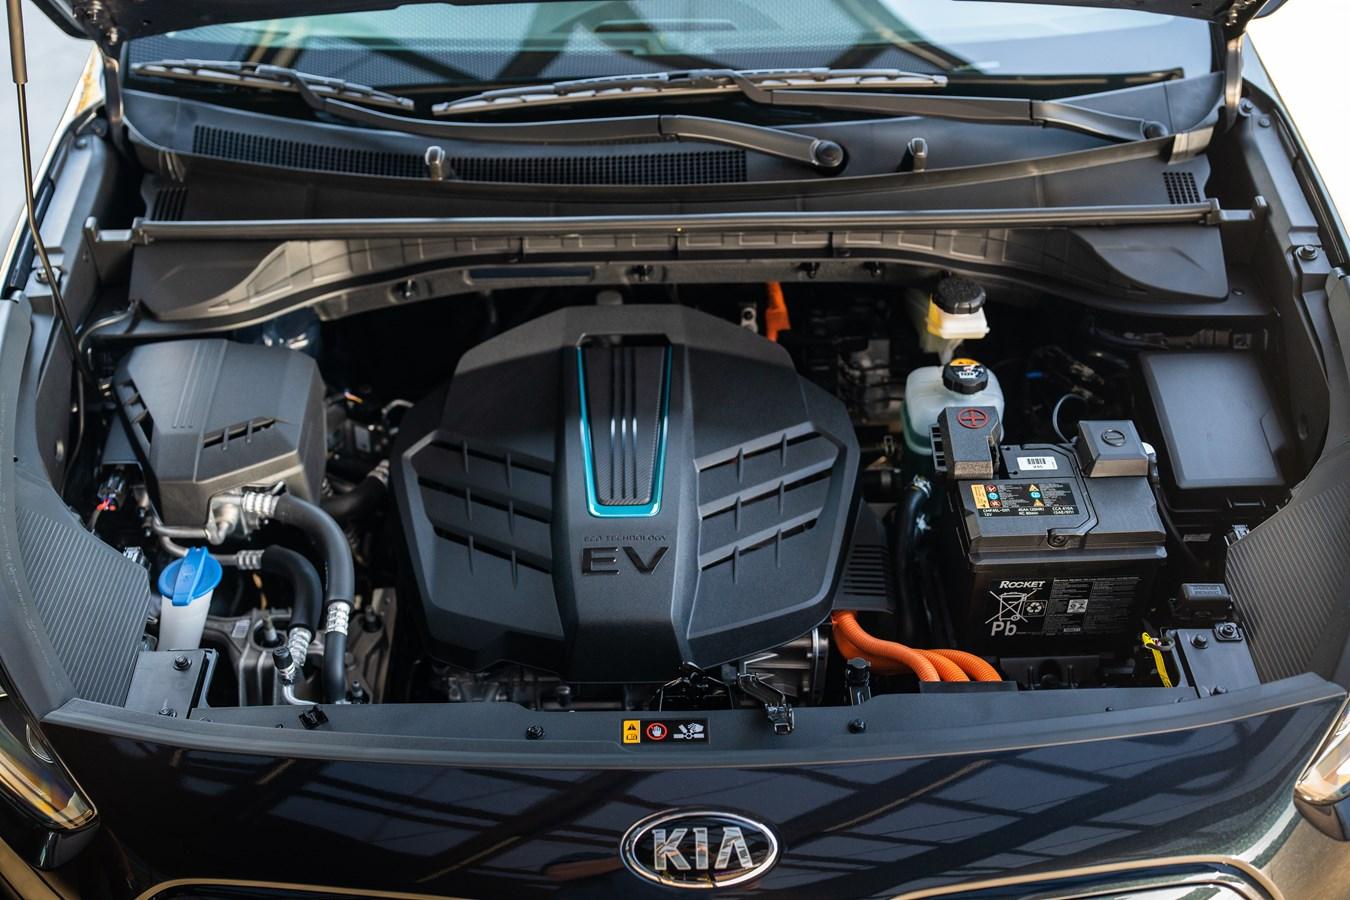 Kia Niro EV under the hood